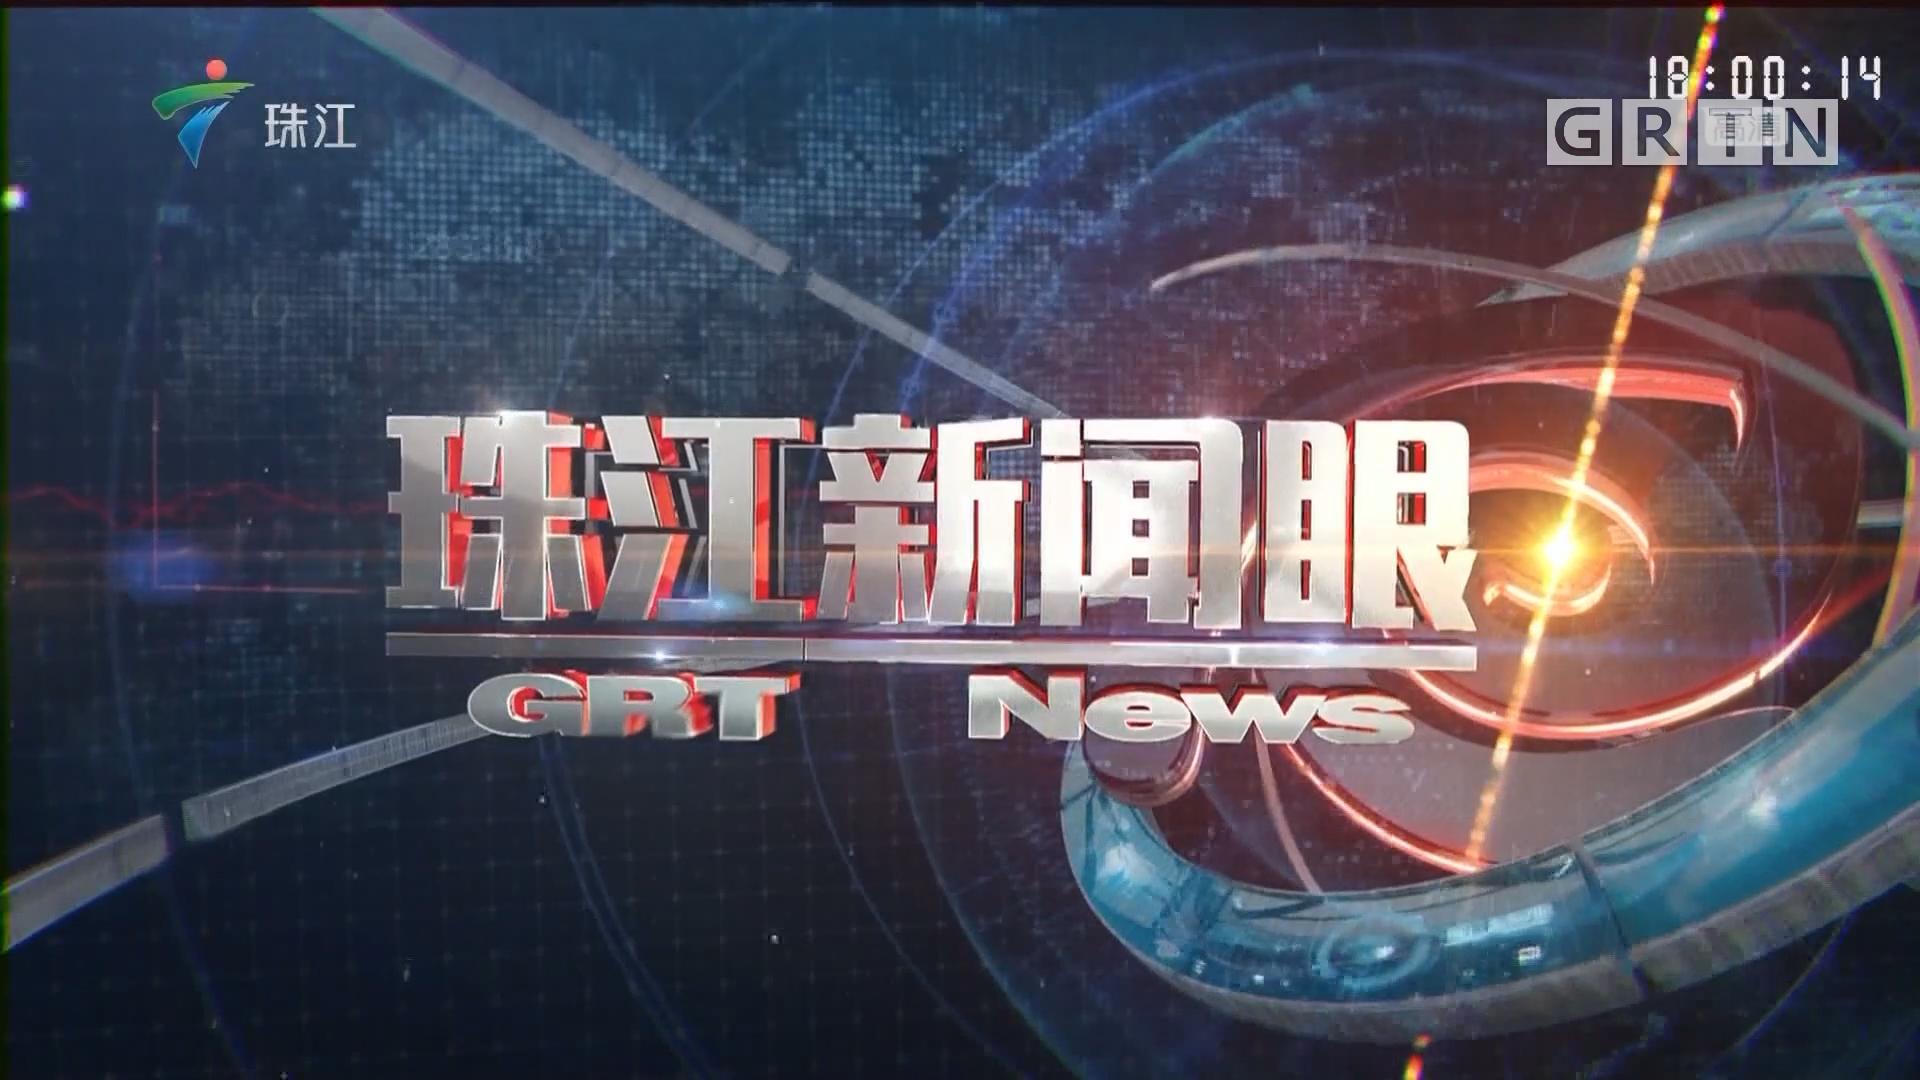 [HD][2018-12-09]珠江新闻眼:广东省庆祝改革开放40周年文艺晚会在广州举行